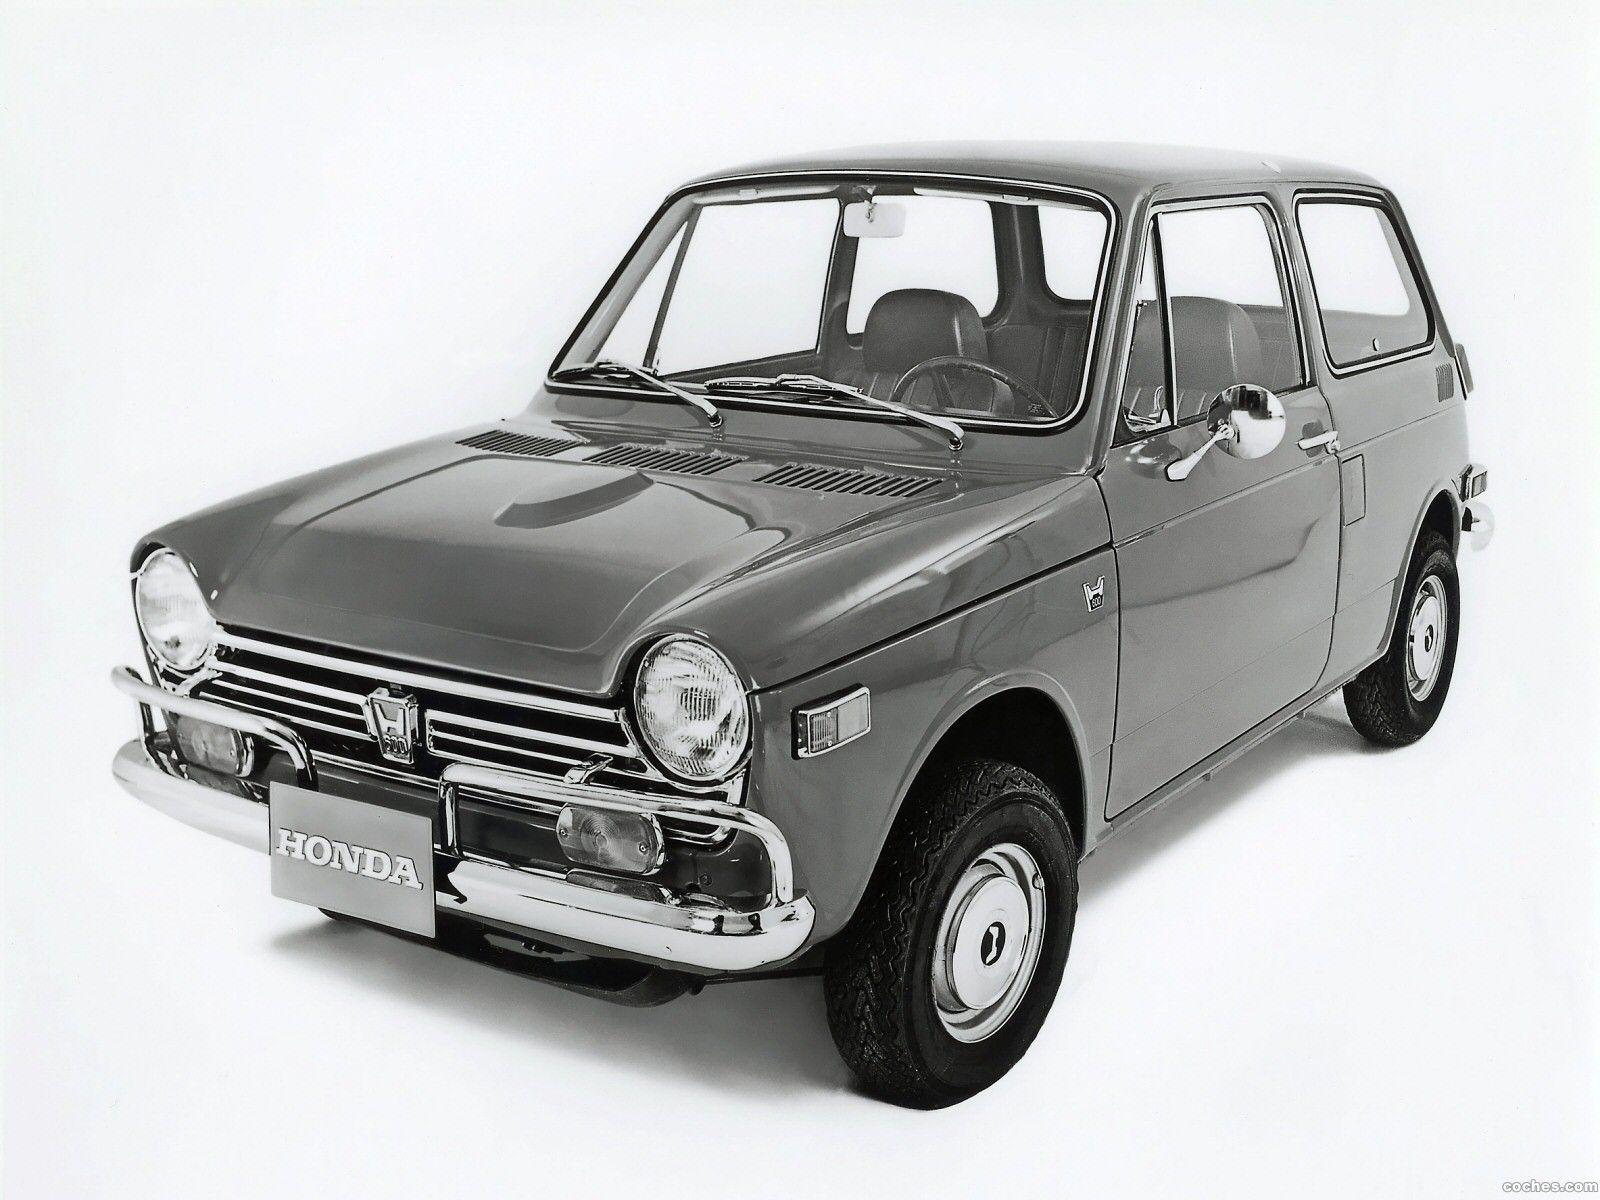 1967 honda n600 list of honda automobiles wikipedia the free encyclopedia honda models history